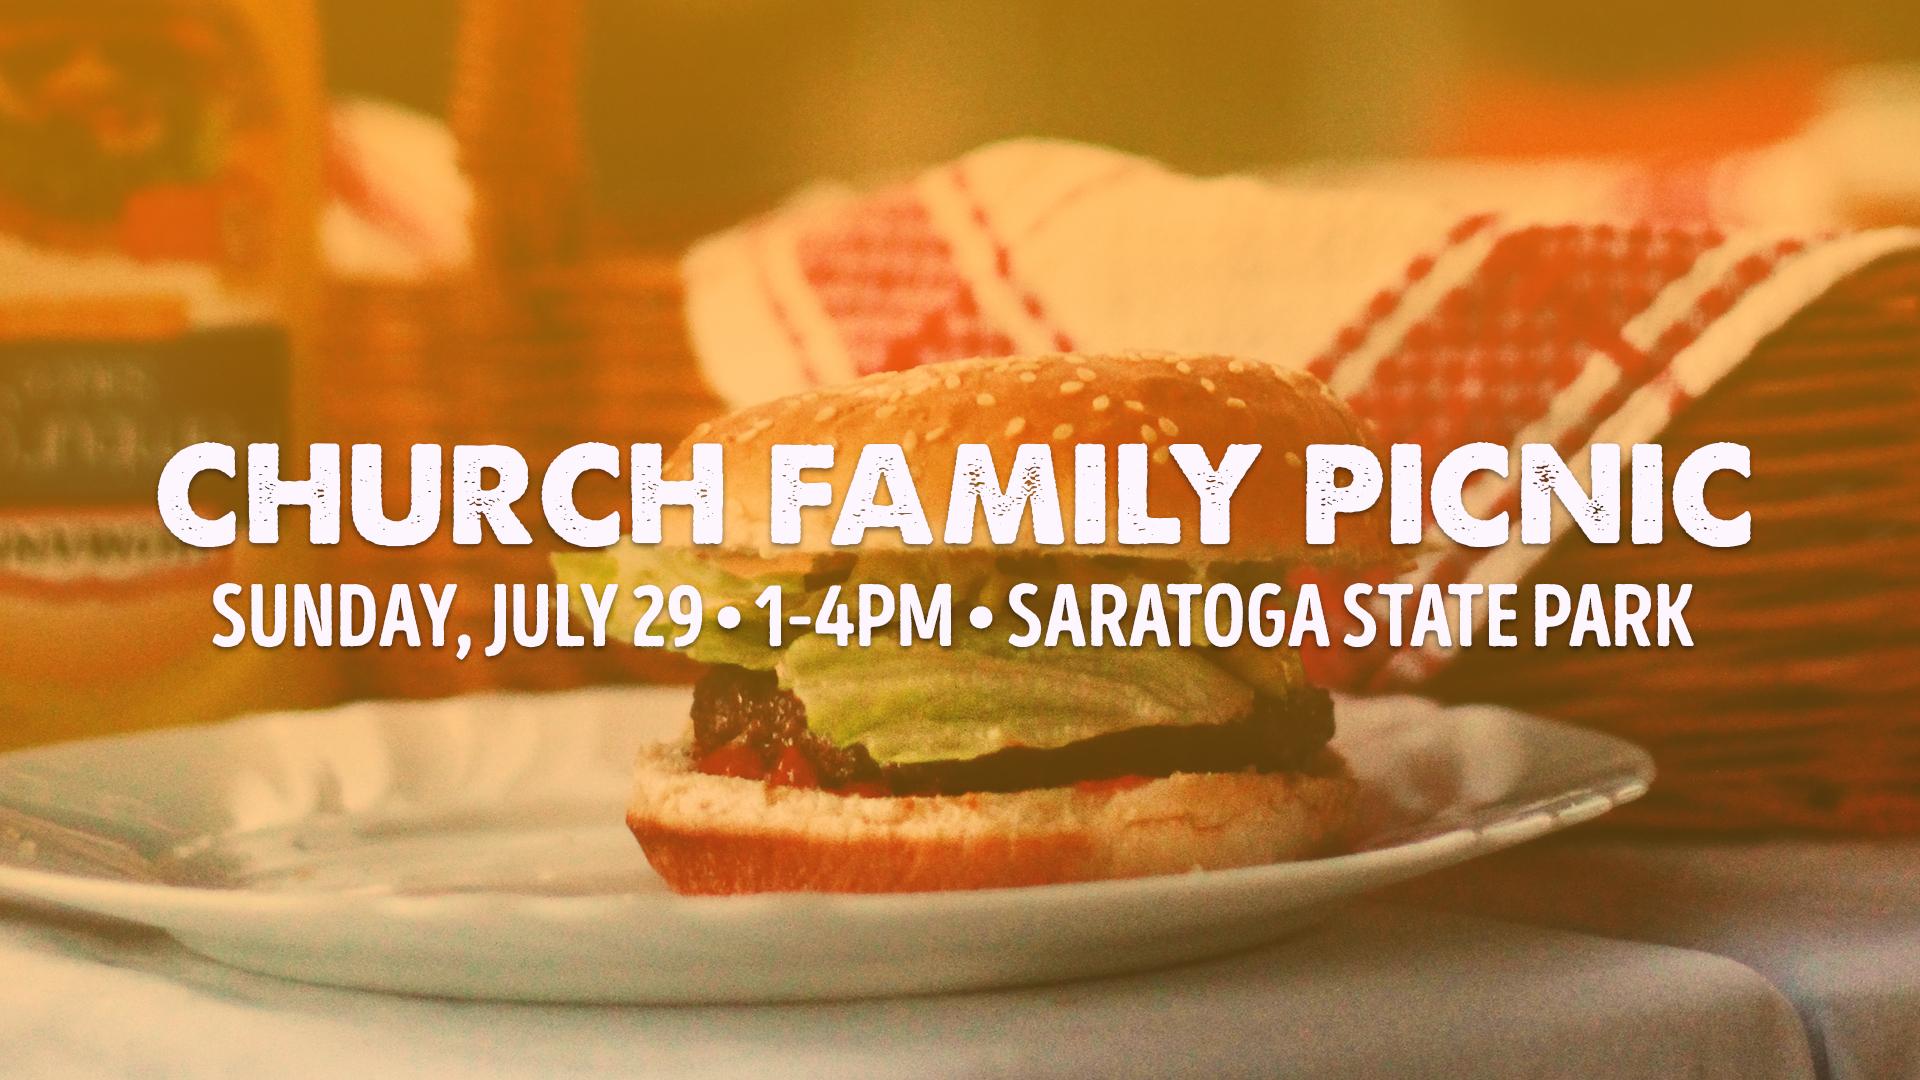 Church Picnic-Sunday, July 29th